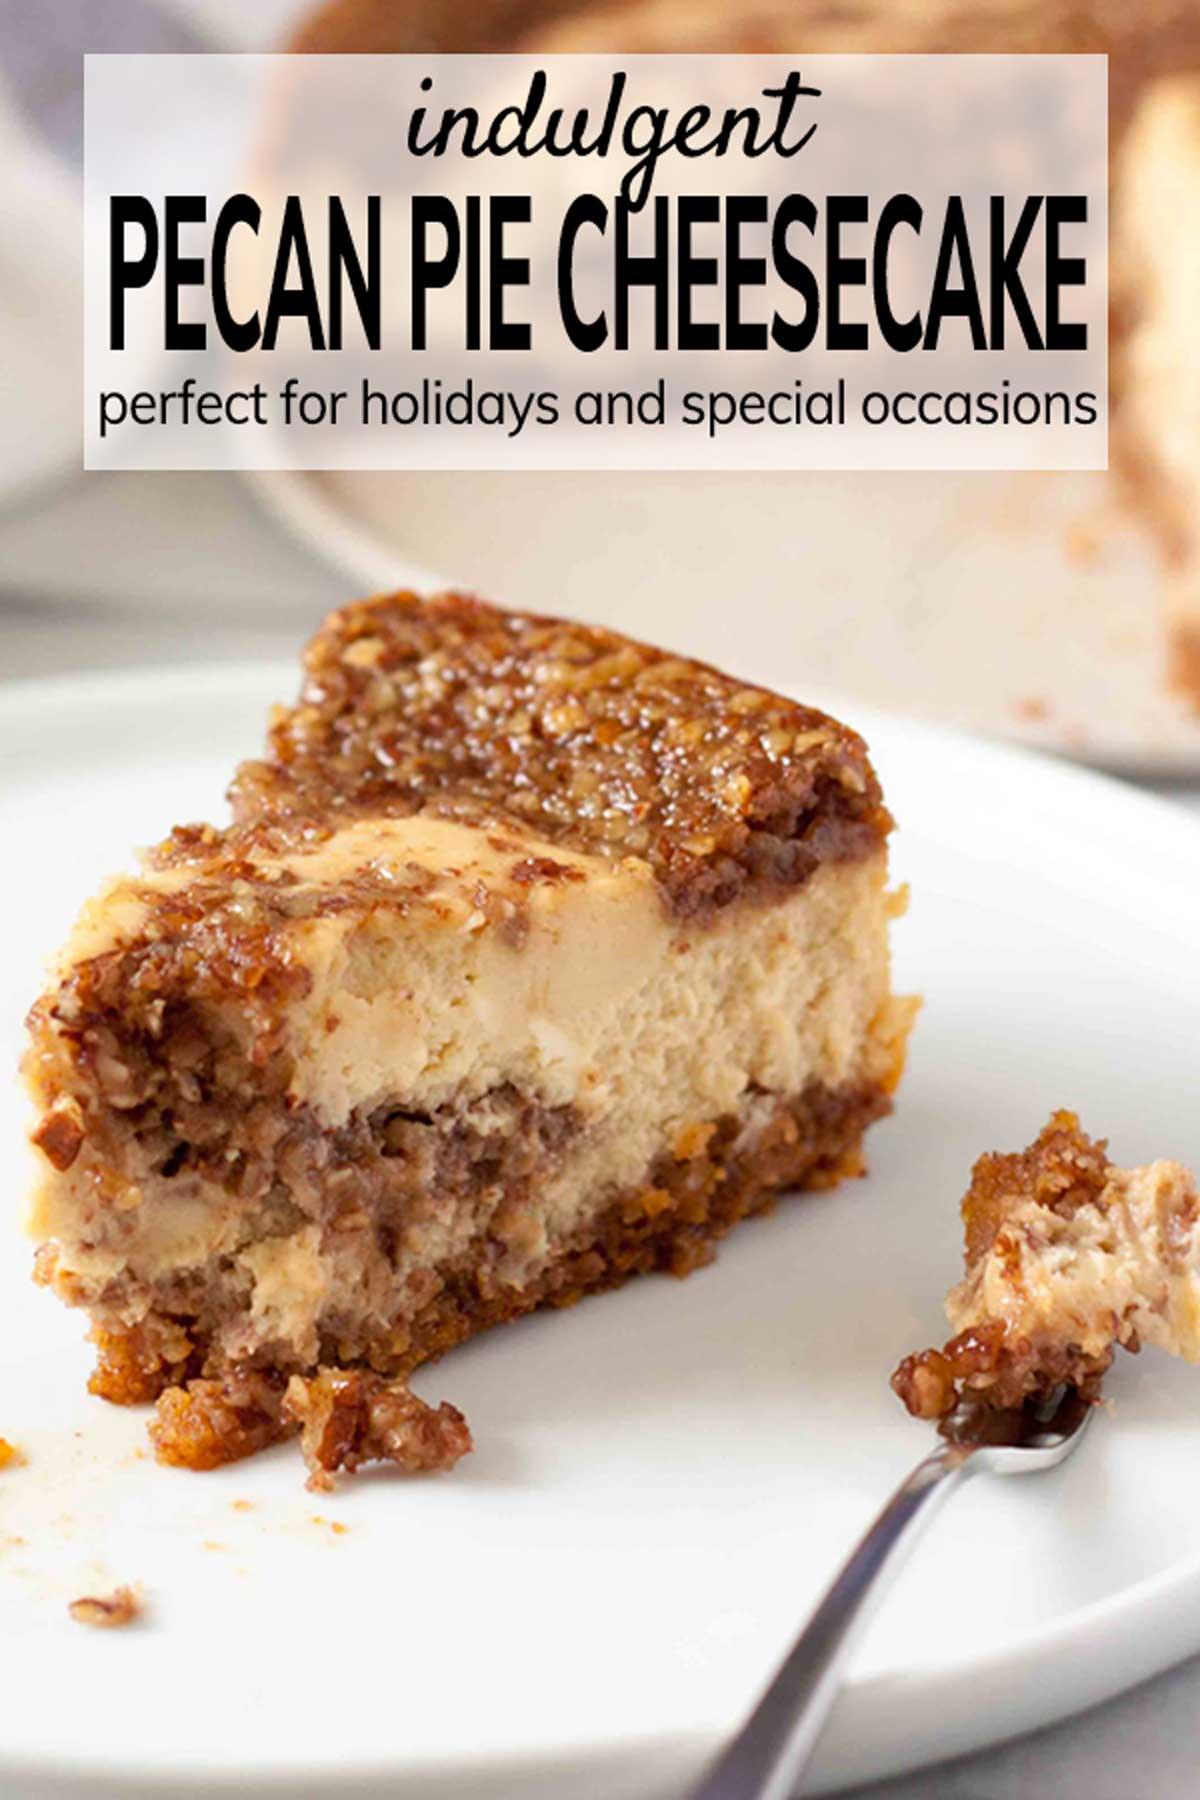 Sliced Pecan Pie Cheesecake